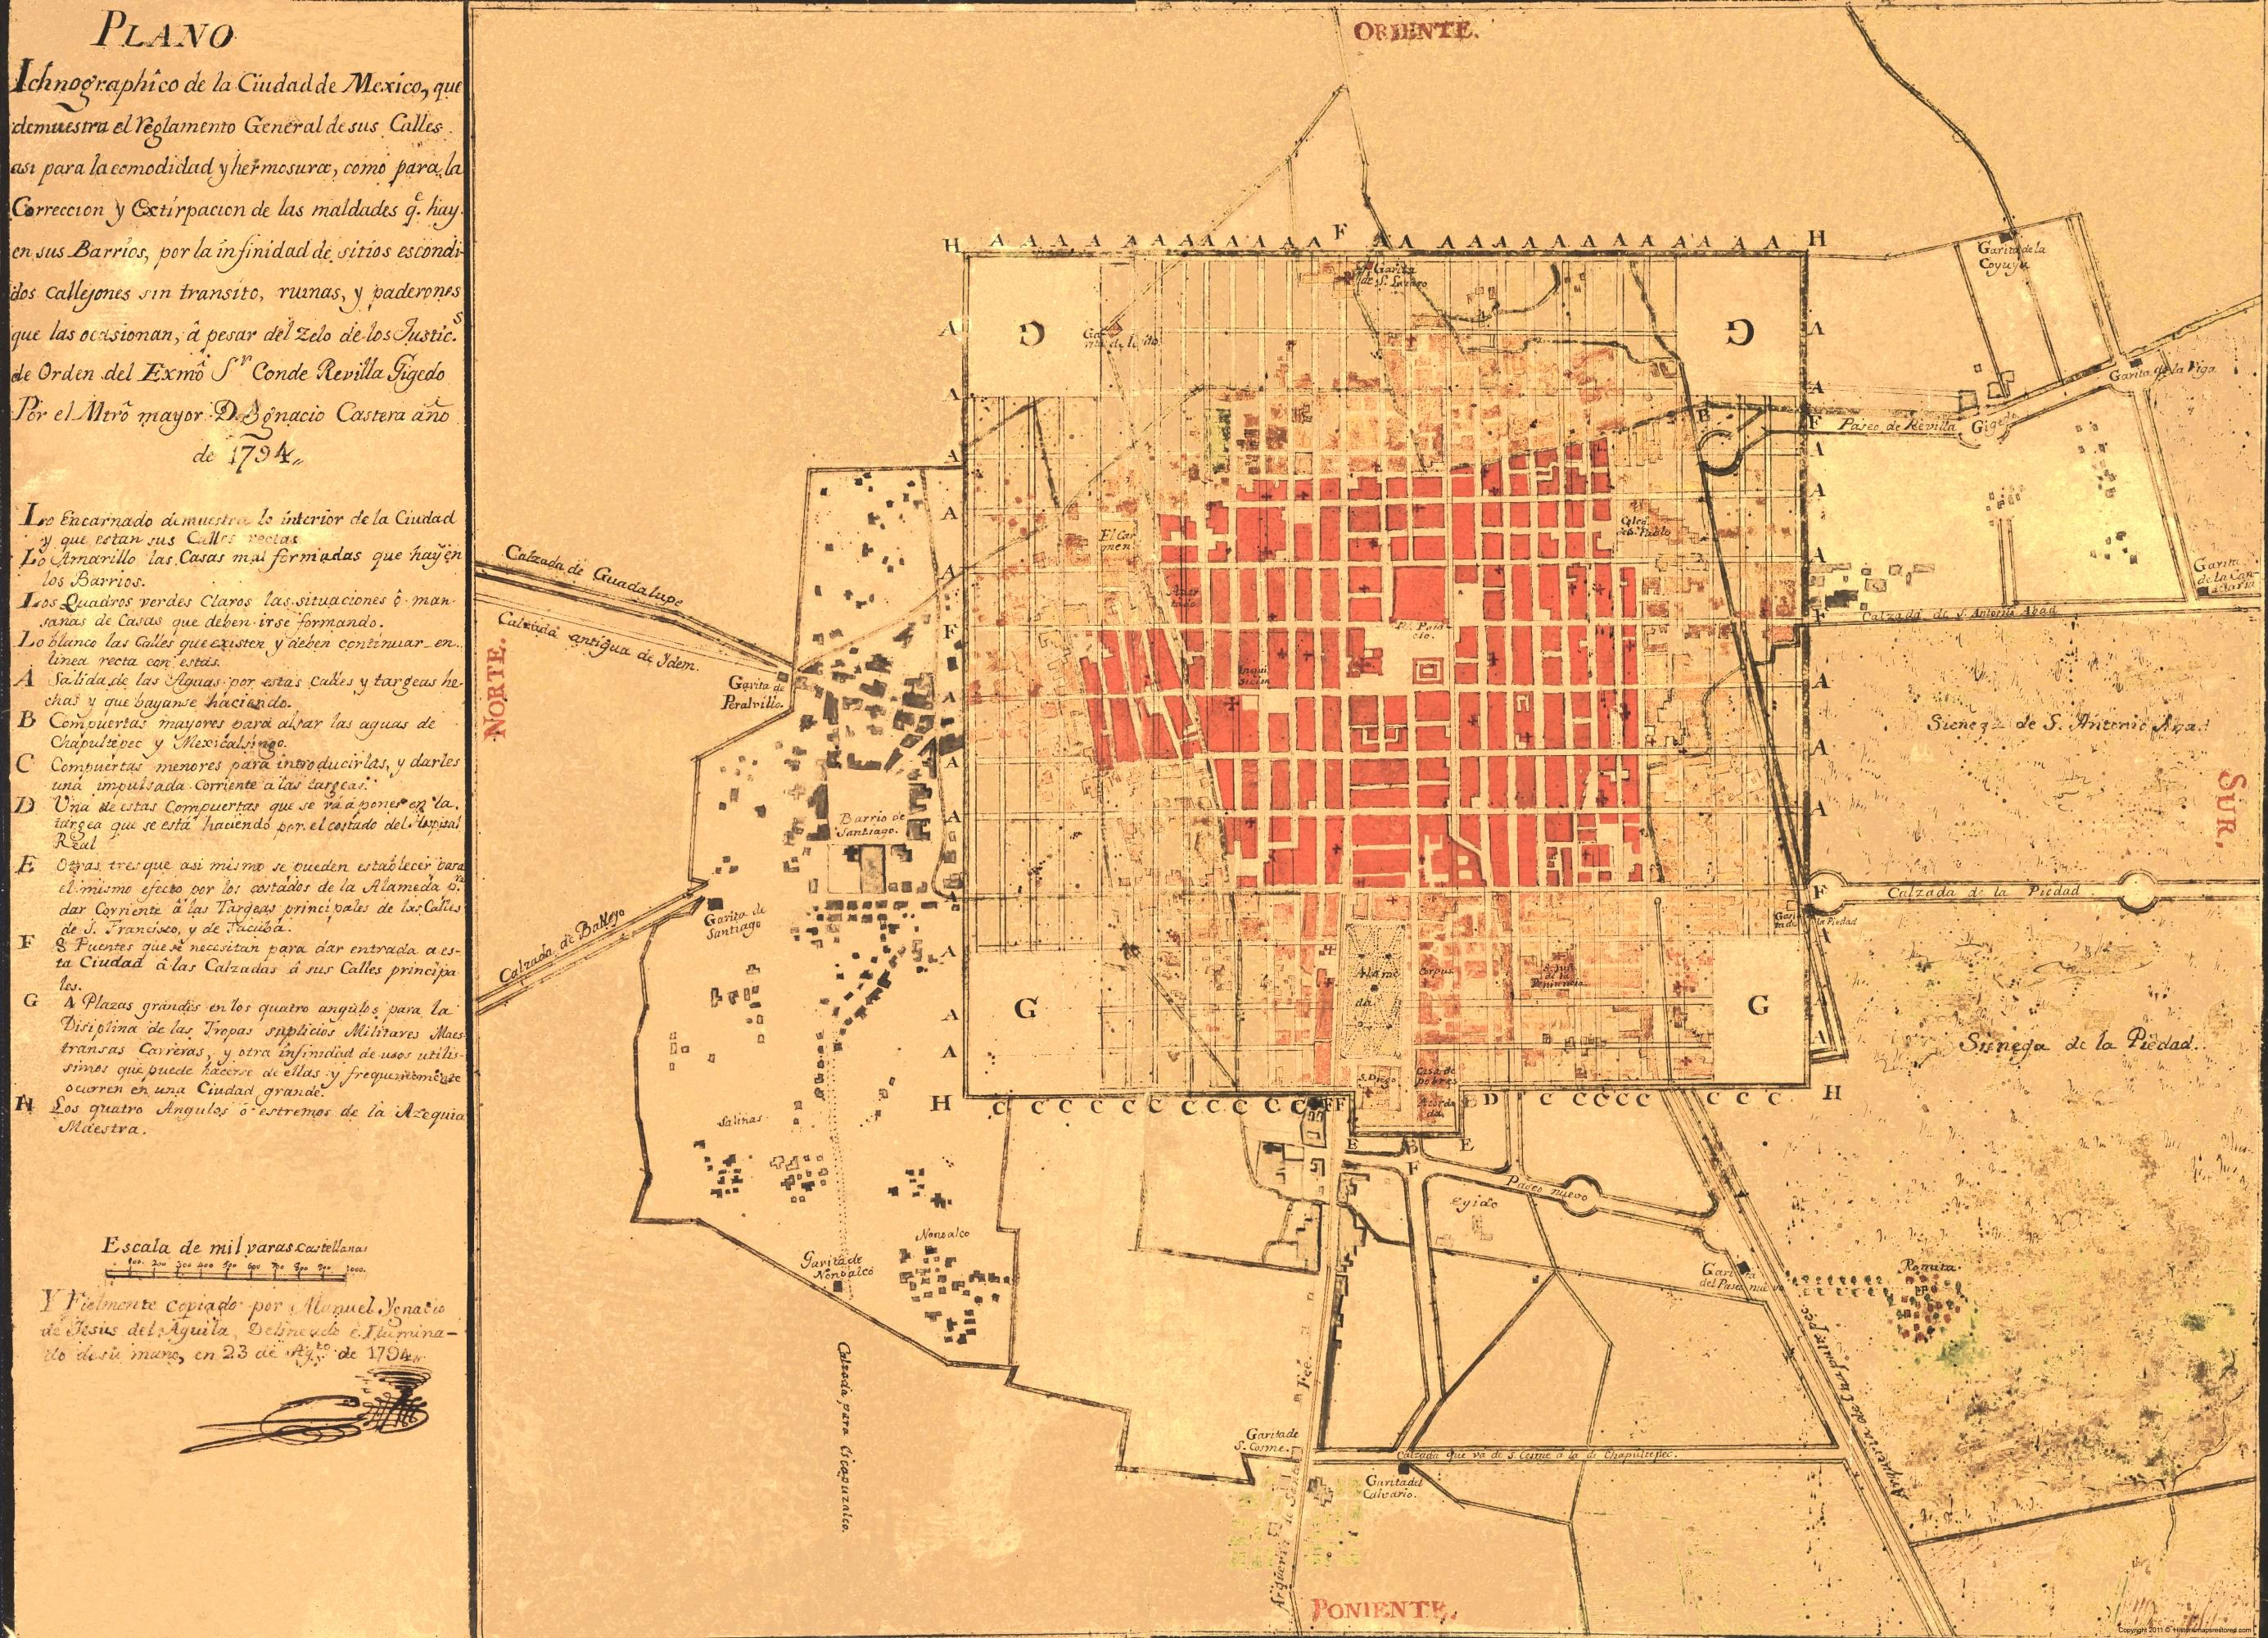 Mexico Map 1794.Old Mexico Map Mexico City Panoramic De Aguila 1794